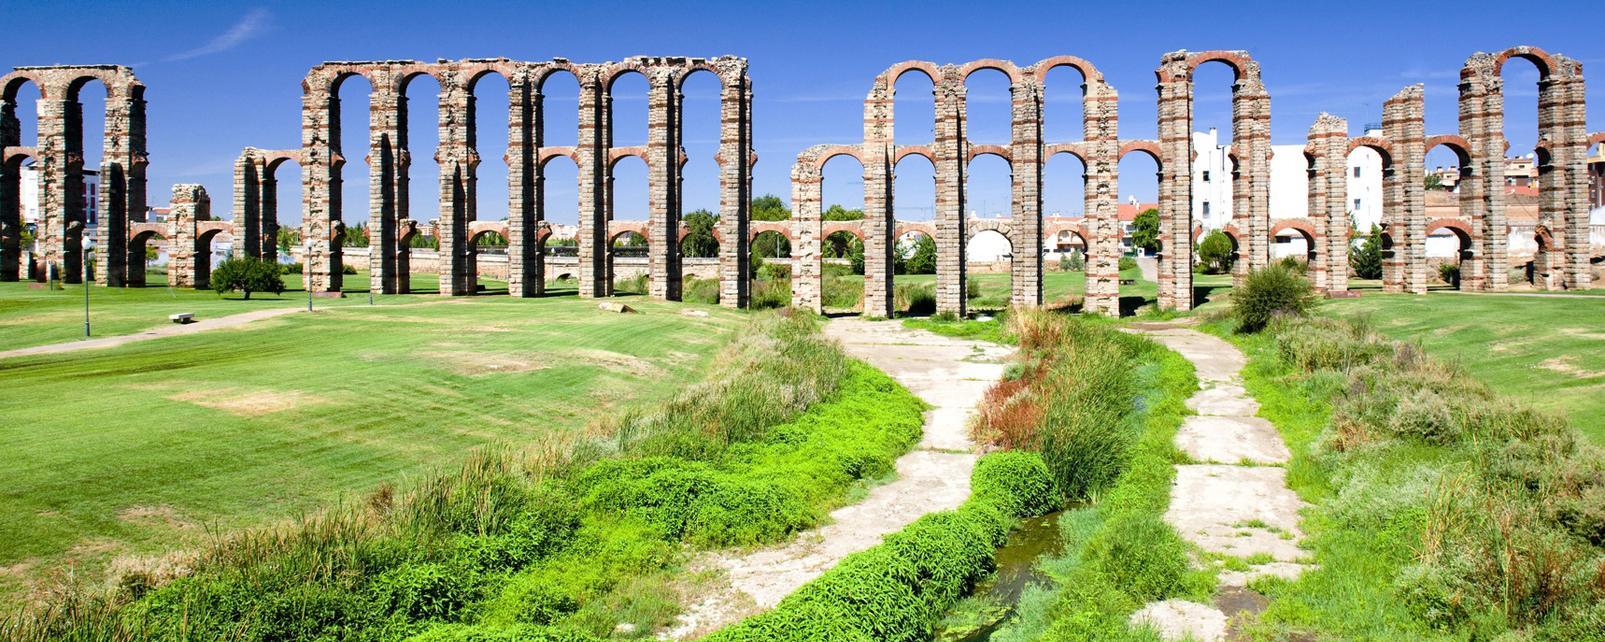 Europe, Espagne, Extremadure, Badajoz, Mérida, aqueduc, Los Milagros, rivière,